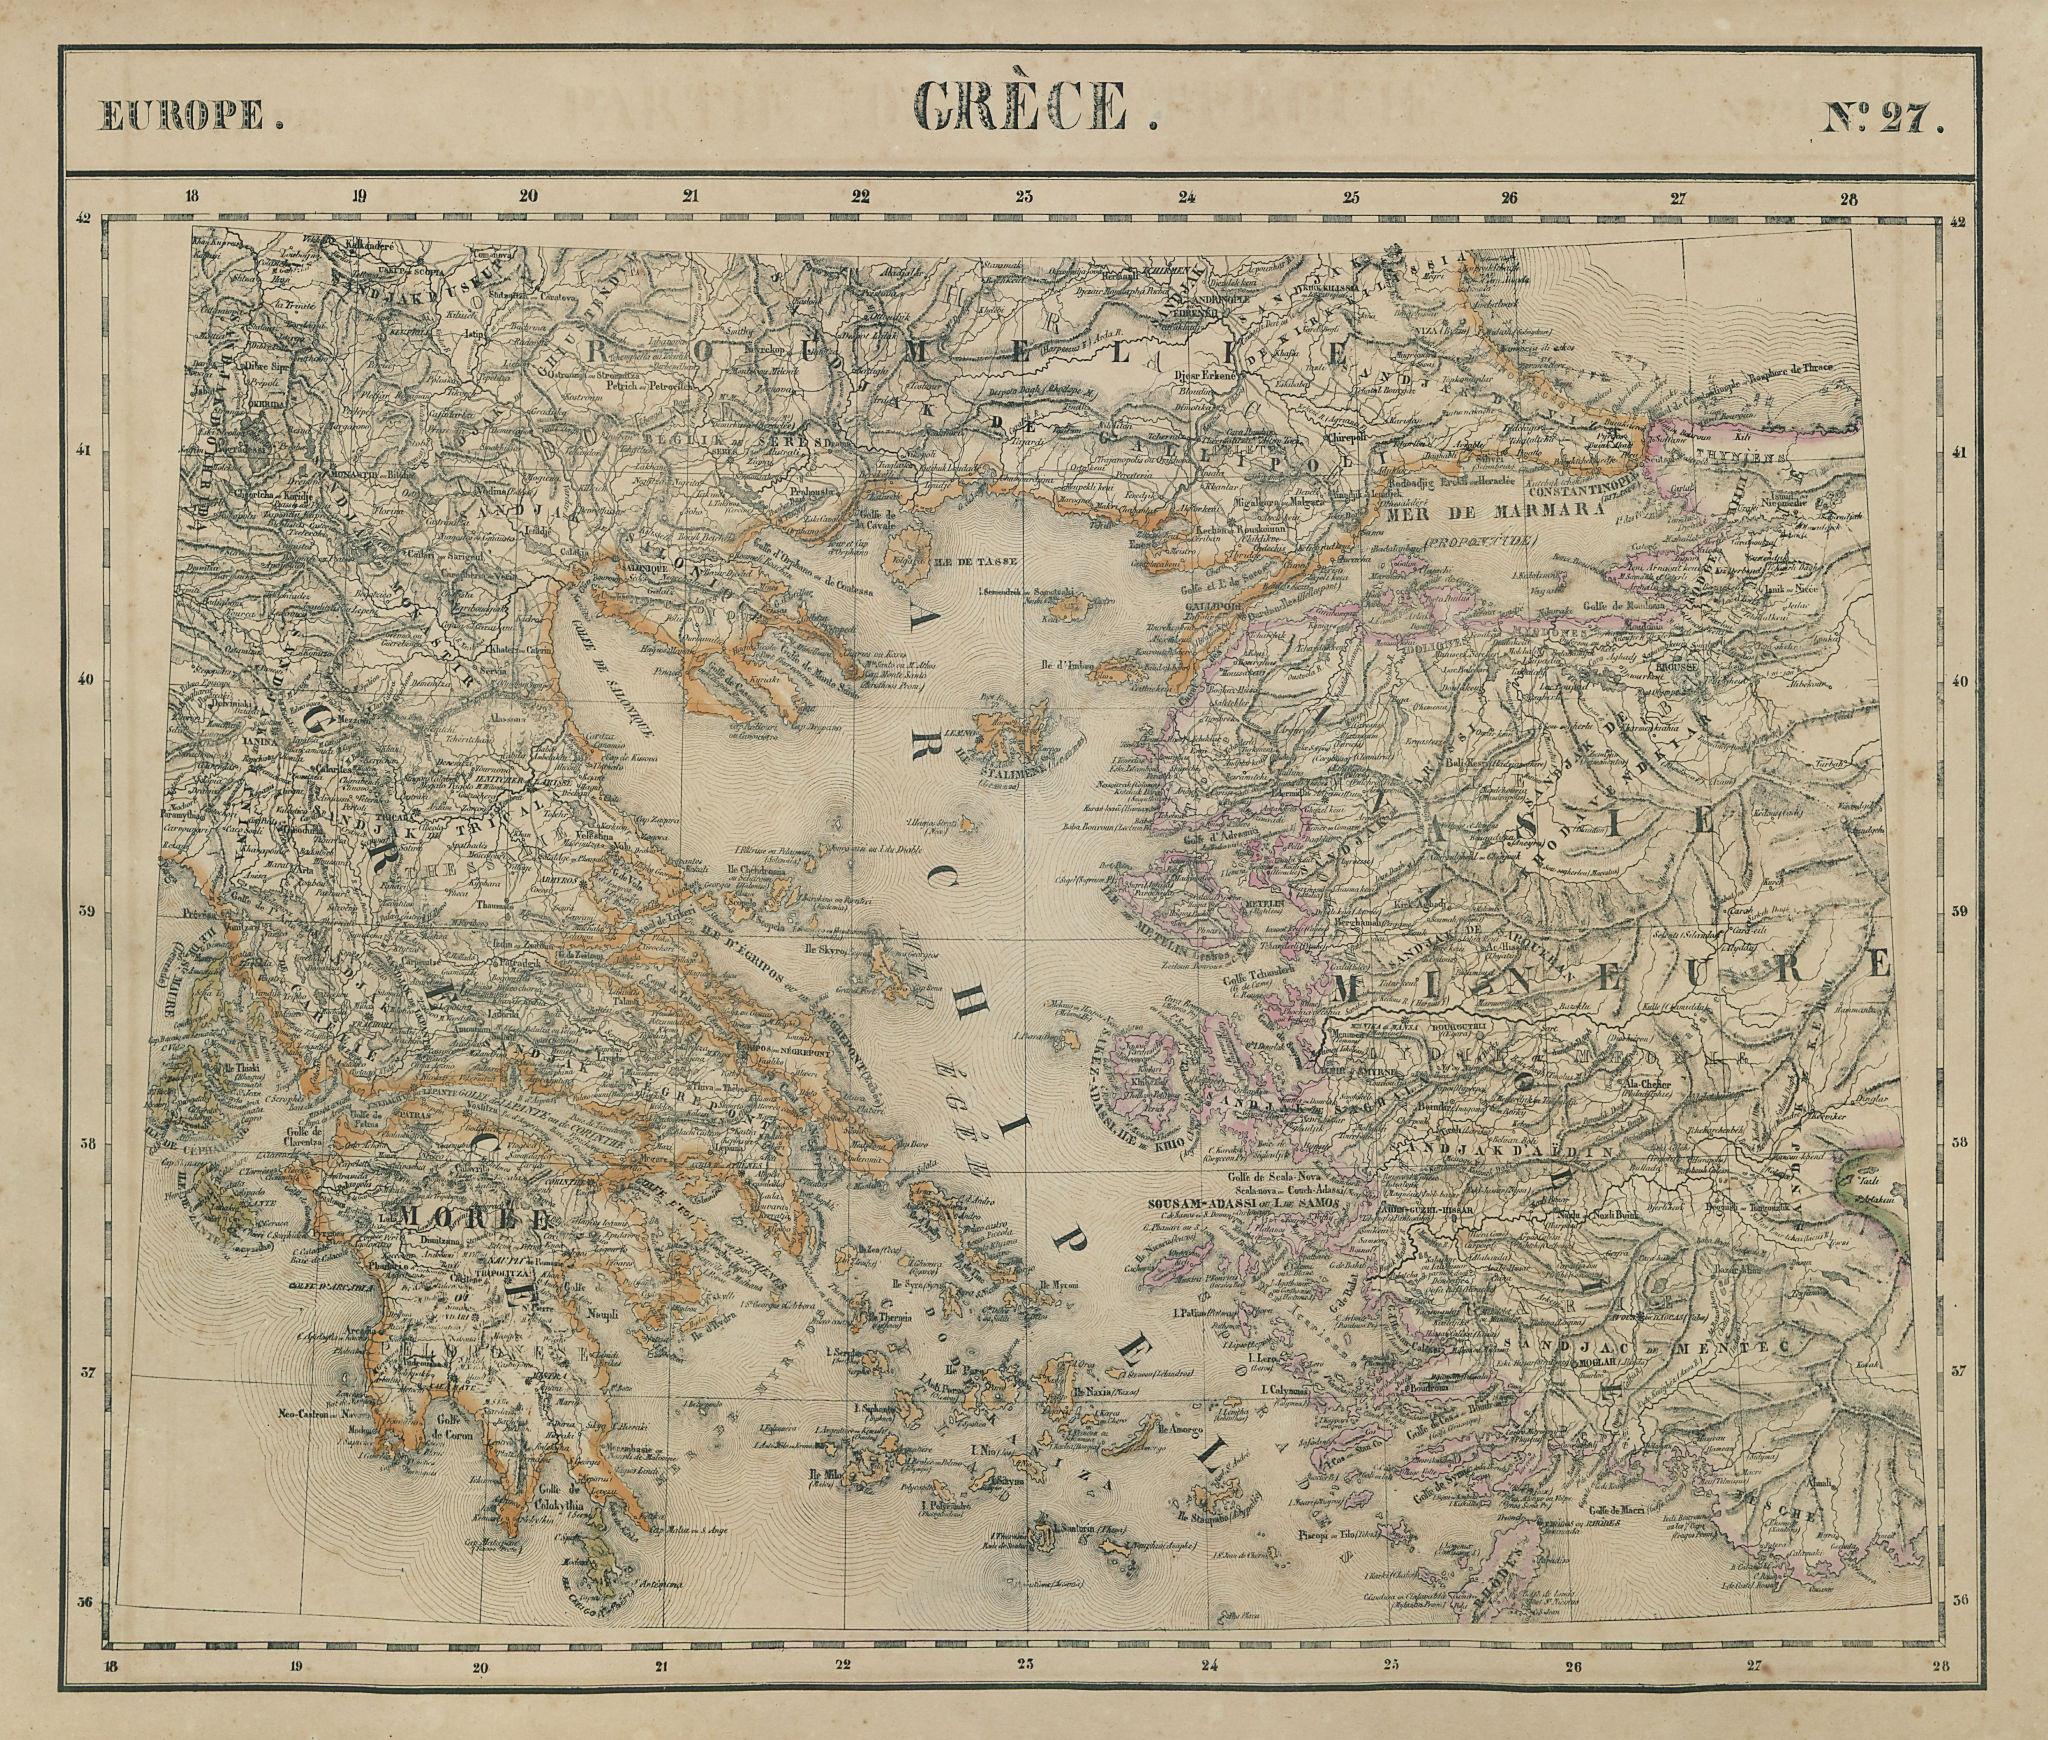 Europe. Grèce #27 Greece, Aegean & western Turkey. VANDERMAELEN 1827 old map